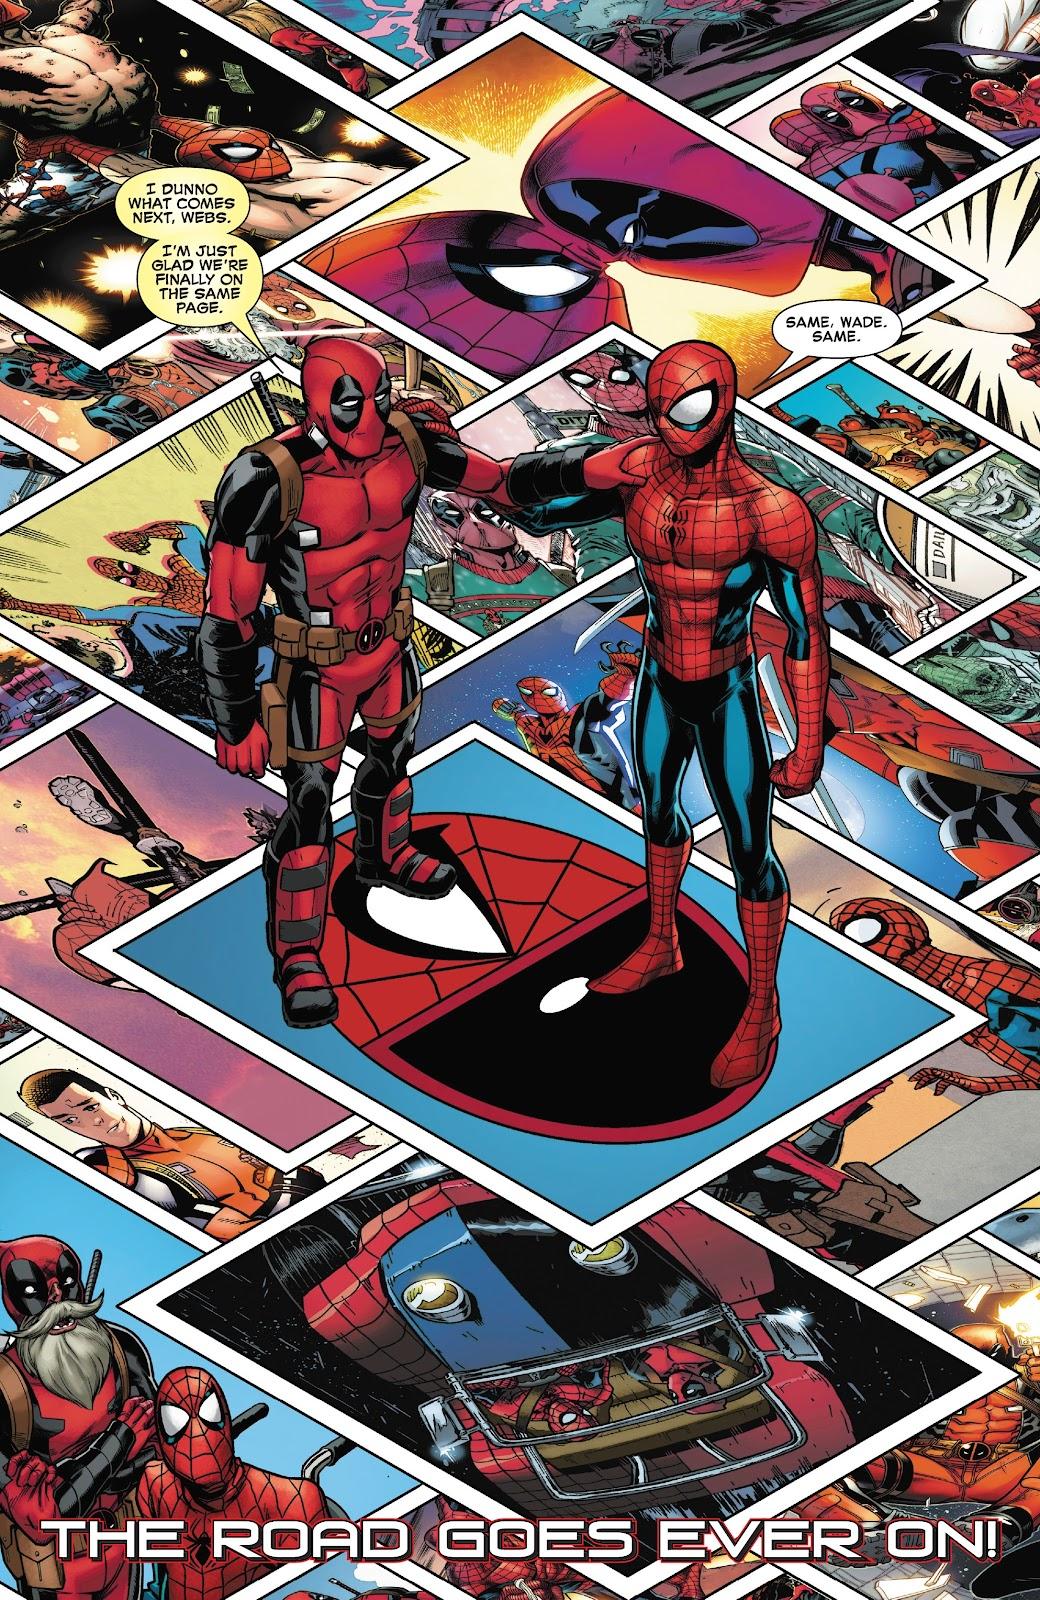 Read online Spider-Man/Deadpool comic -  Issue #50 - 29